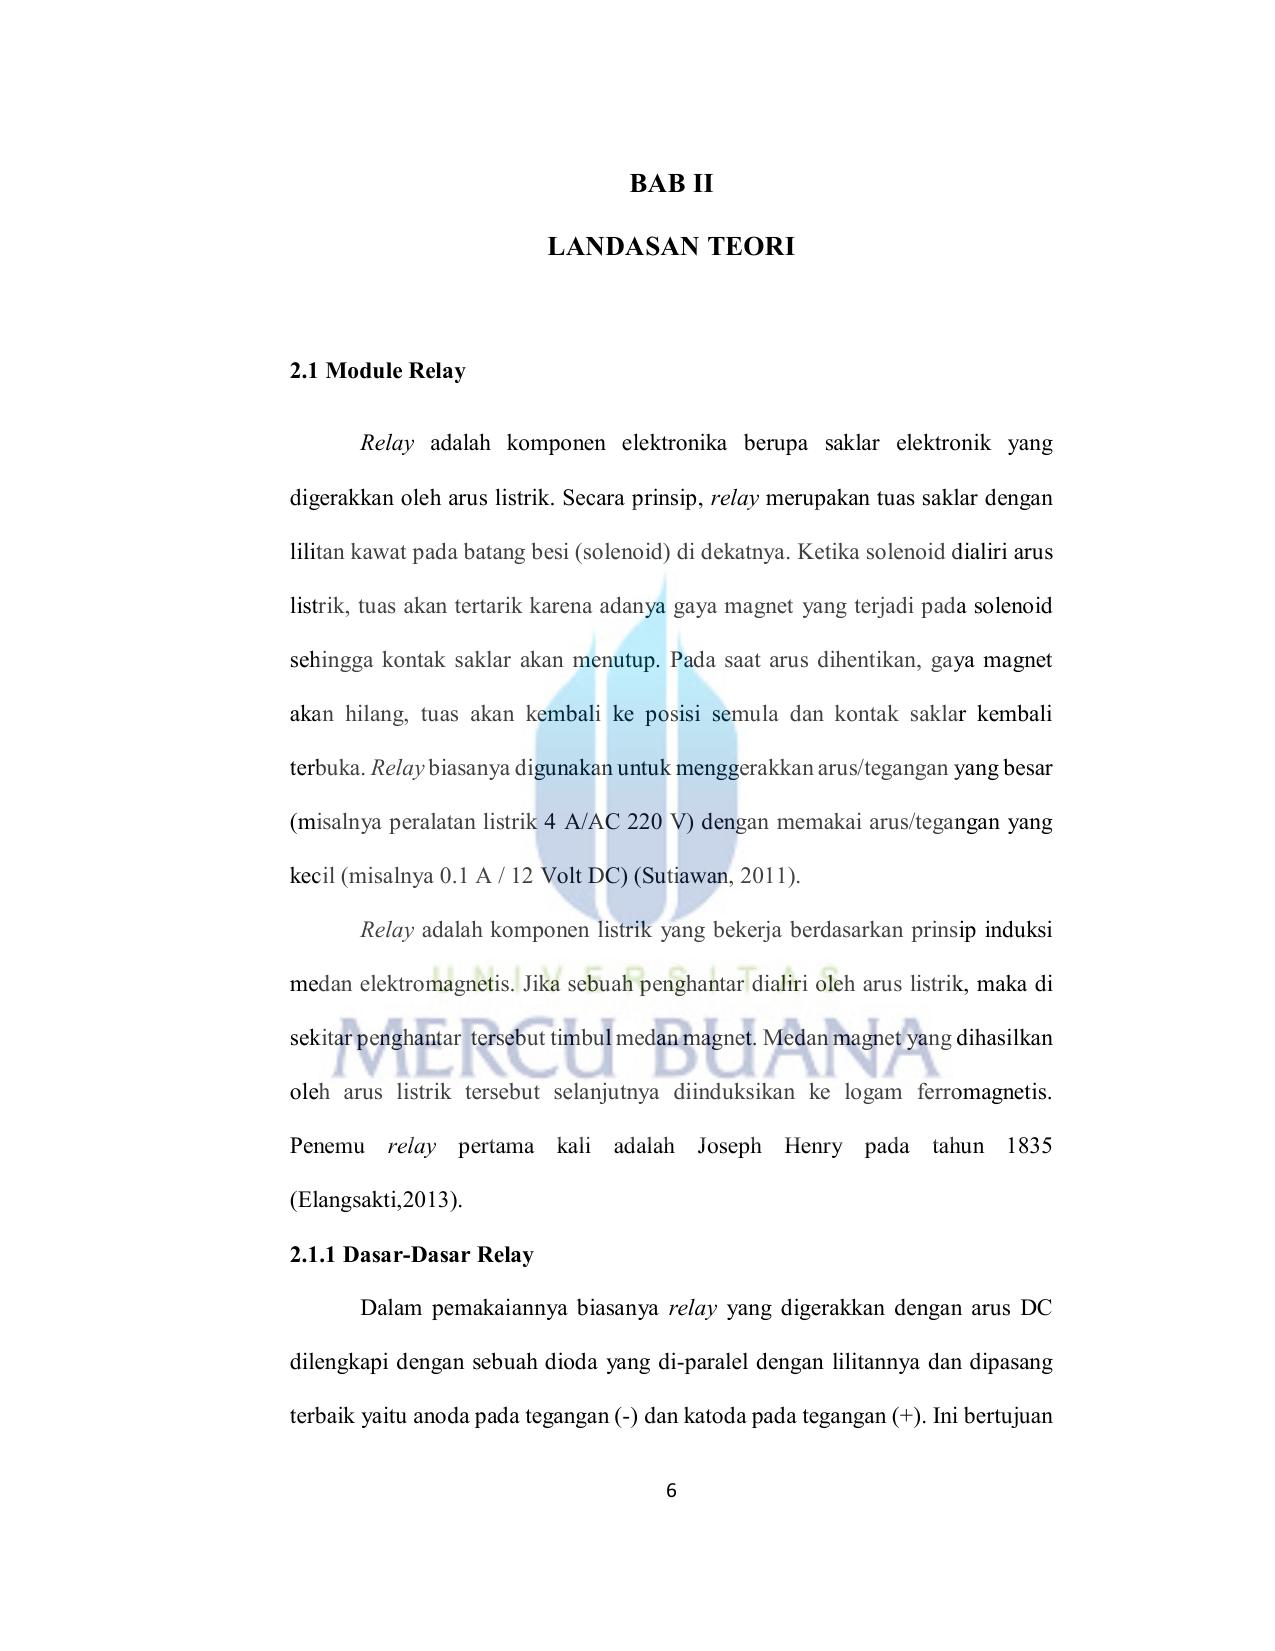 Bab Ii Landasan Teori Perpustakaan Universitas Mercu Buana 9 Volt 2 Amp Power Supply By 78s09